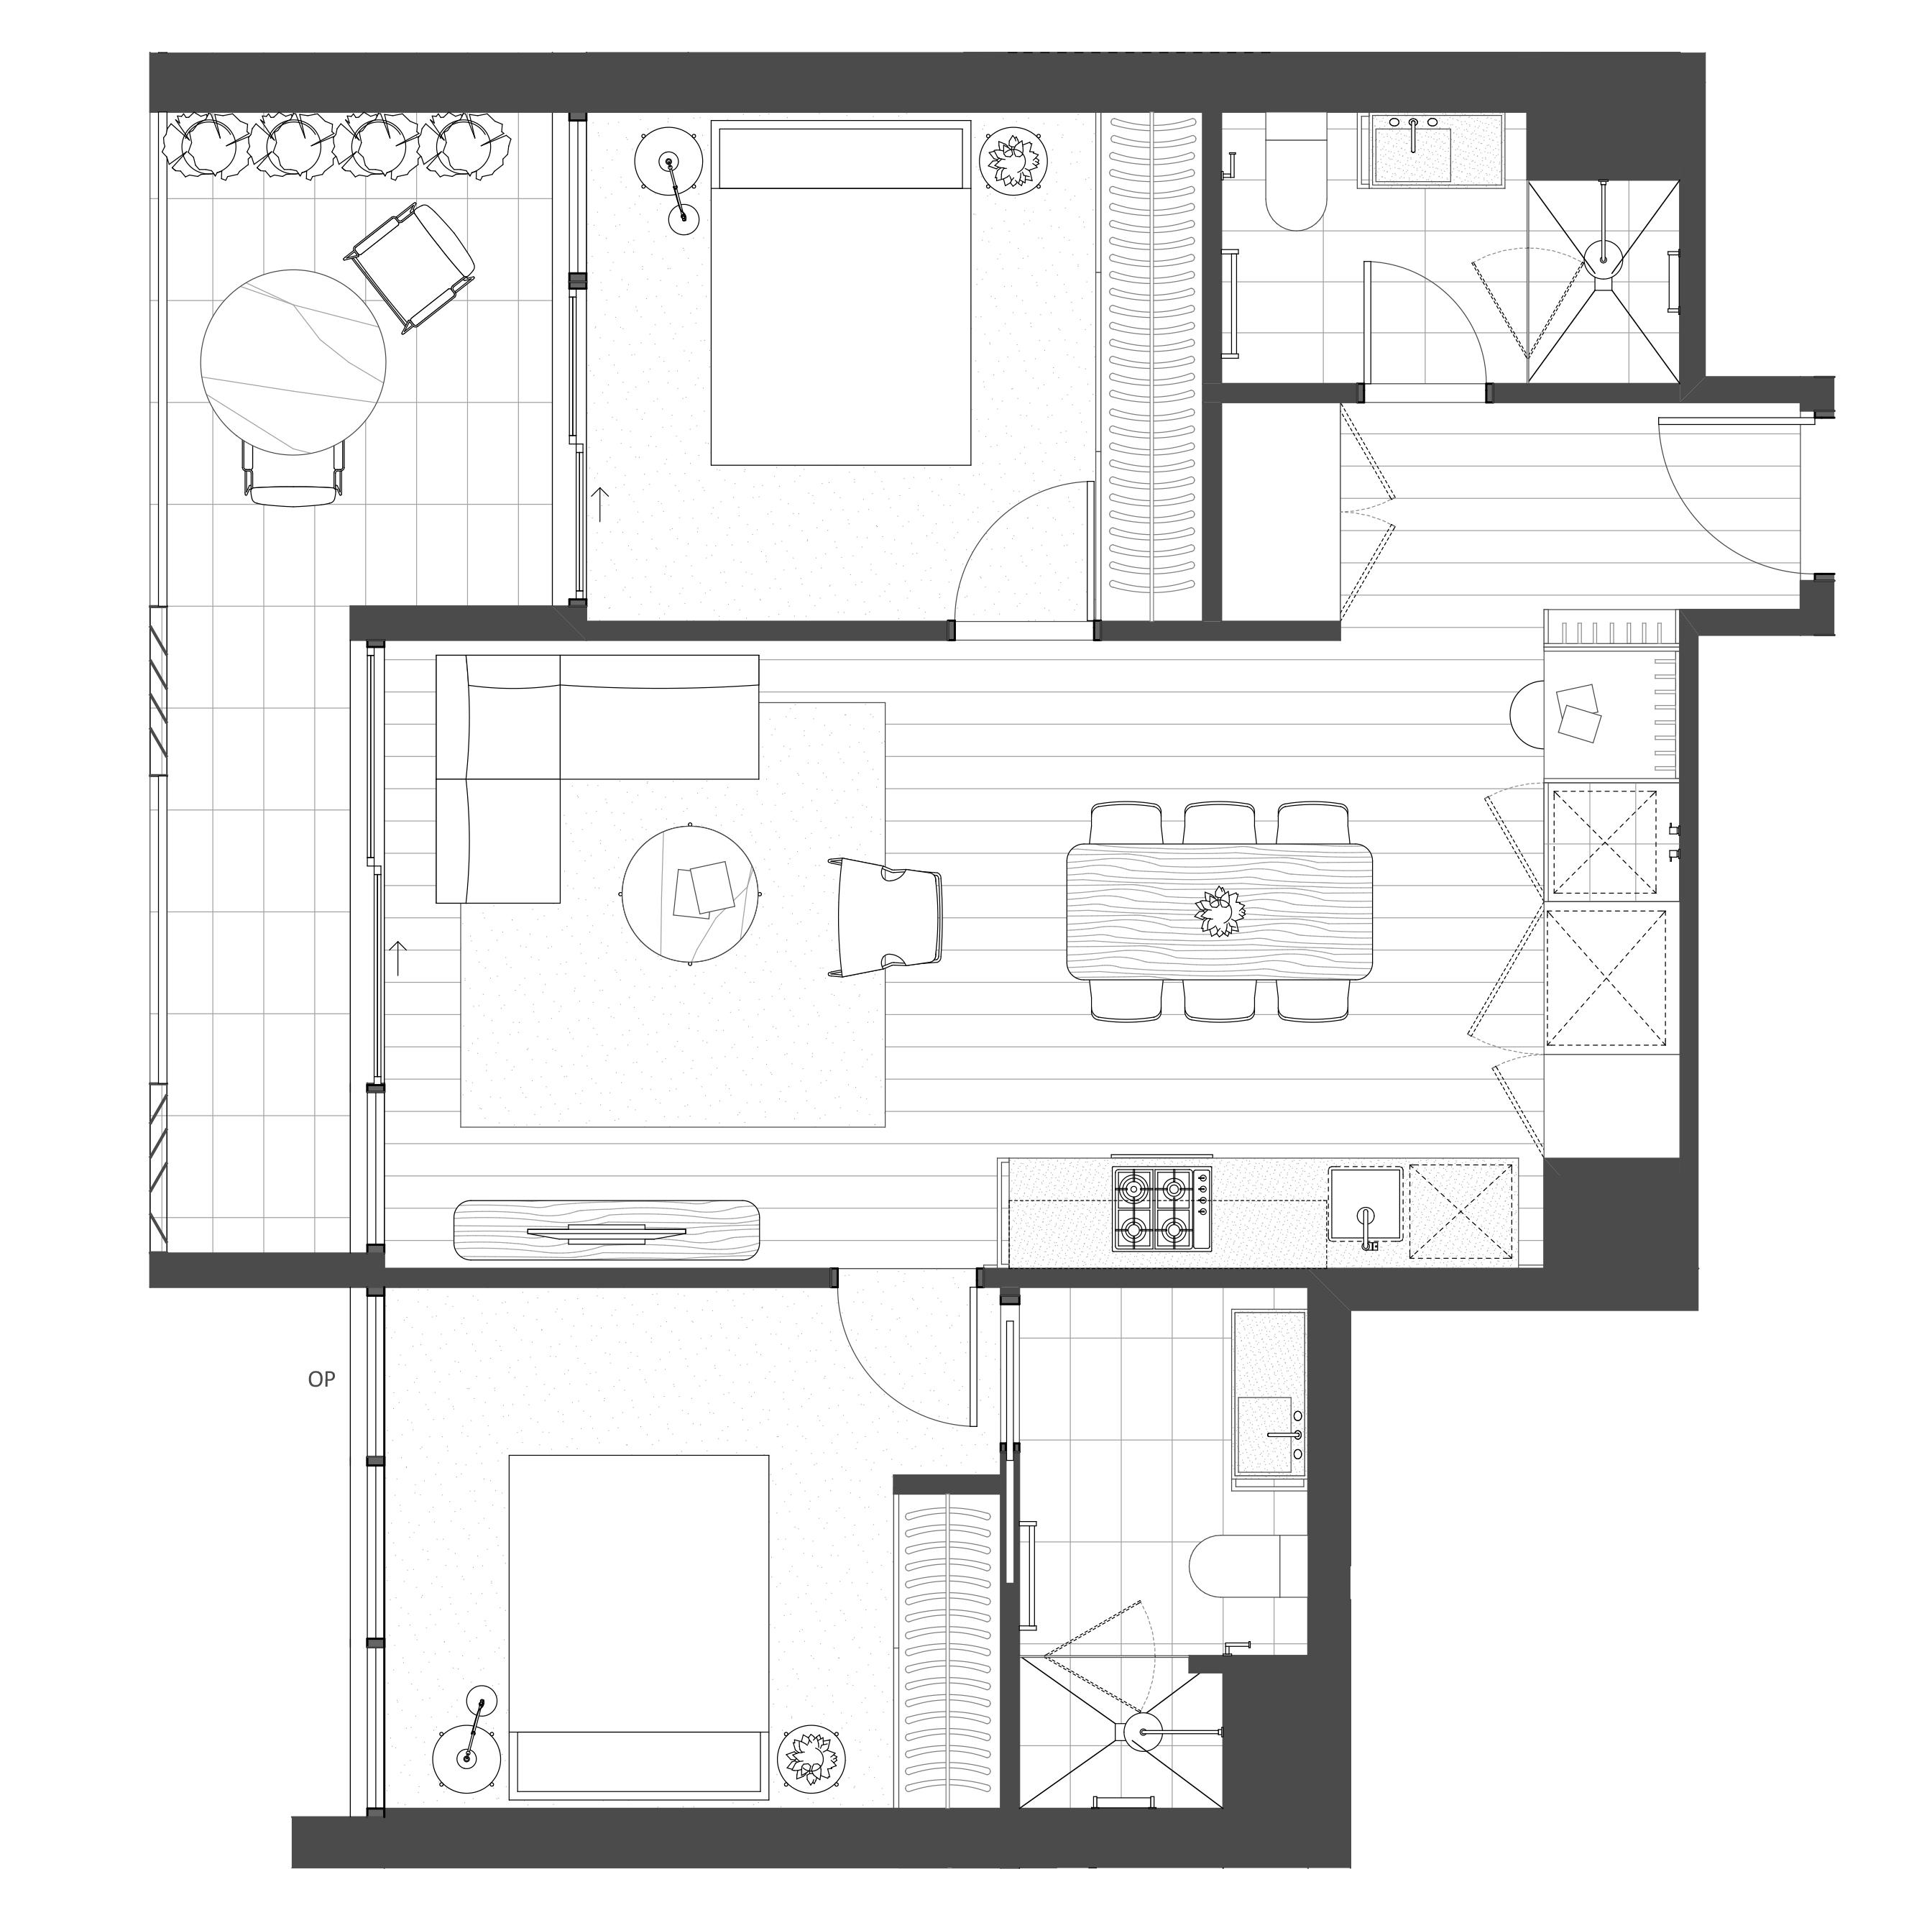 2 Bedroom, 2 Bathroom, 1 Carpark